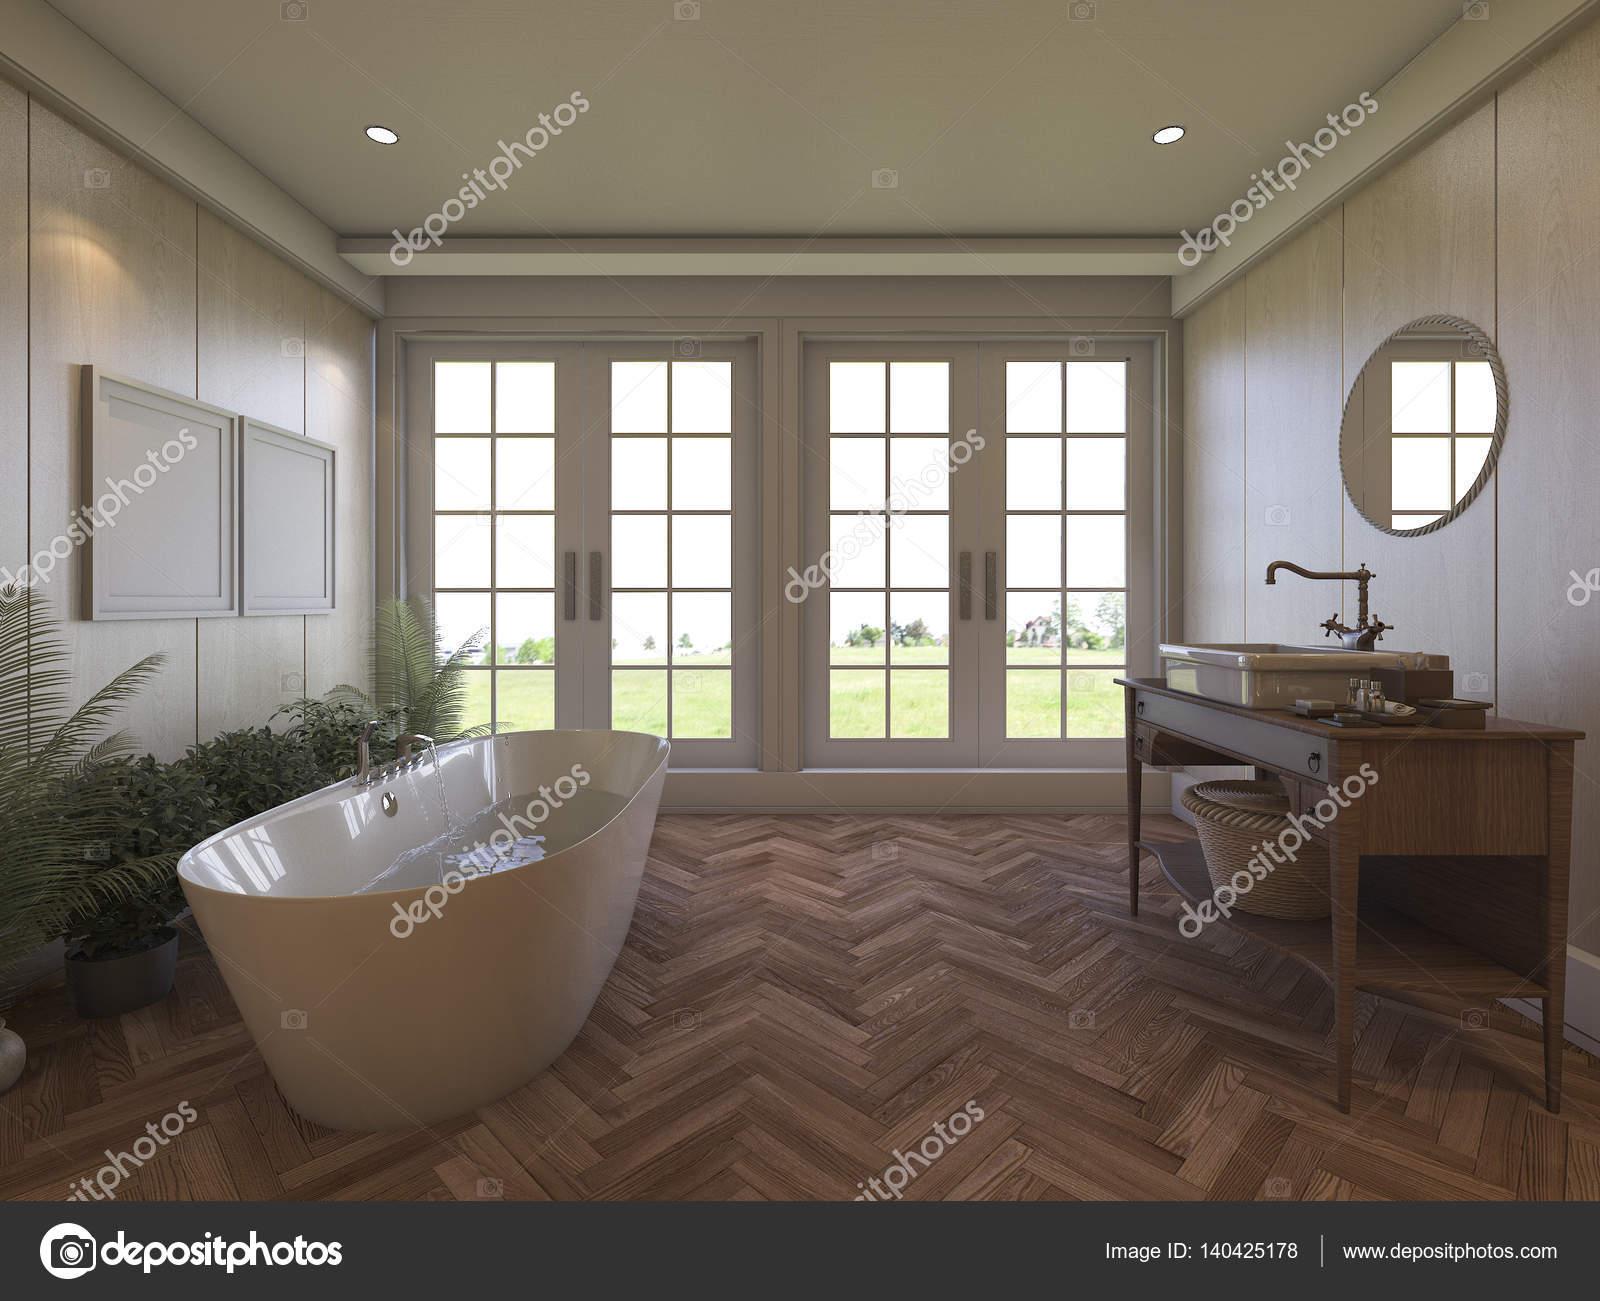 https://st3.depositphotos.com/11352286/14042/i/1600/depositphotos_140425178-stockafbeelding-3d-rendering-brown-laminaat-badkamer.jpg